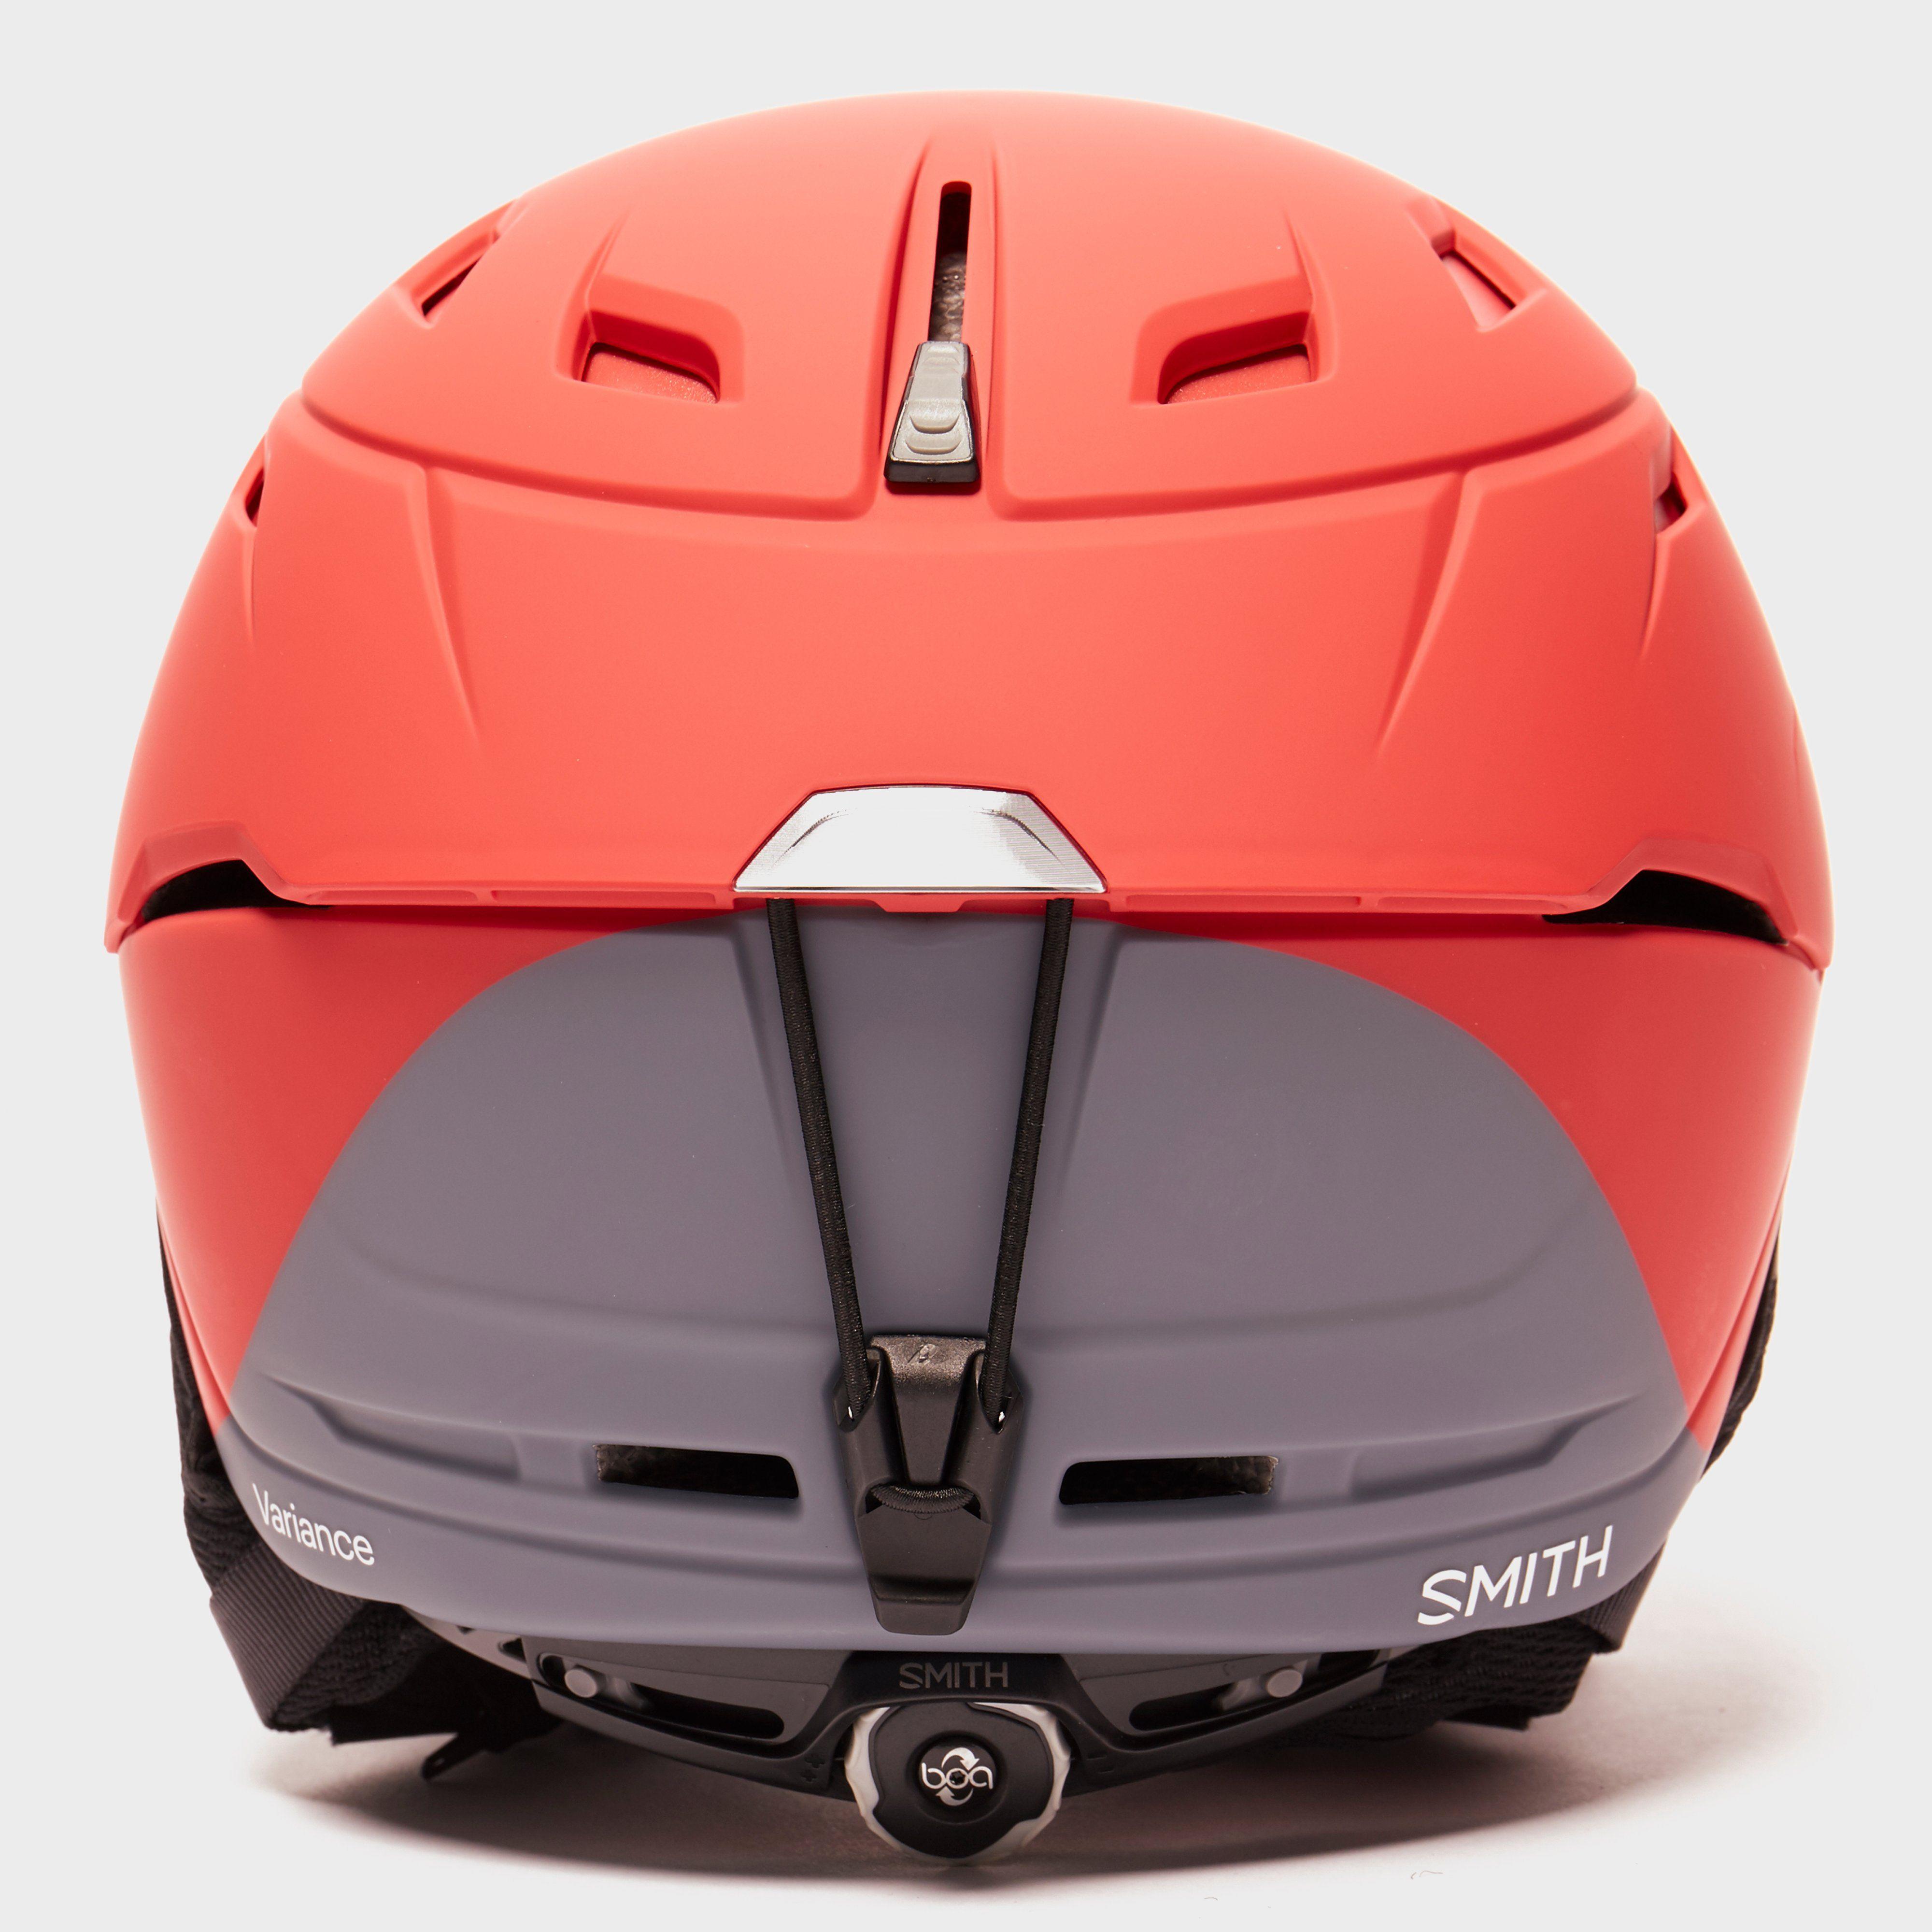 SMITH Men's Variance Helmet